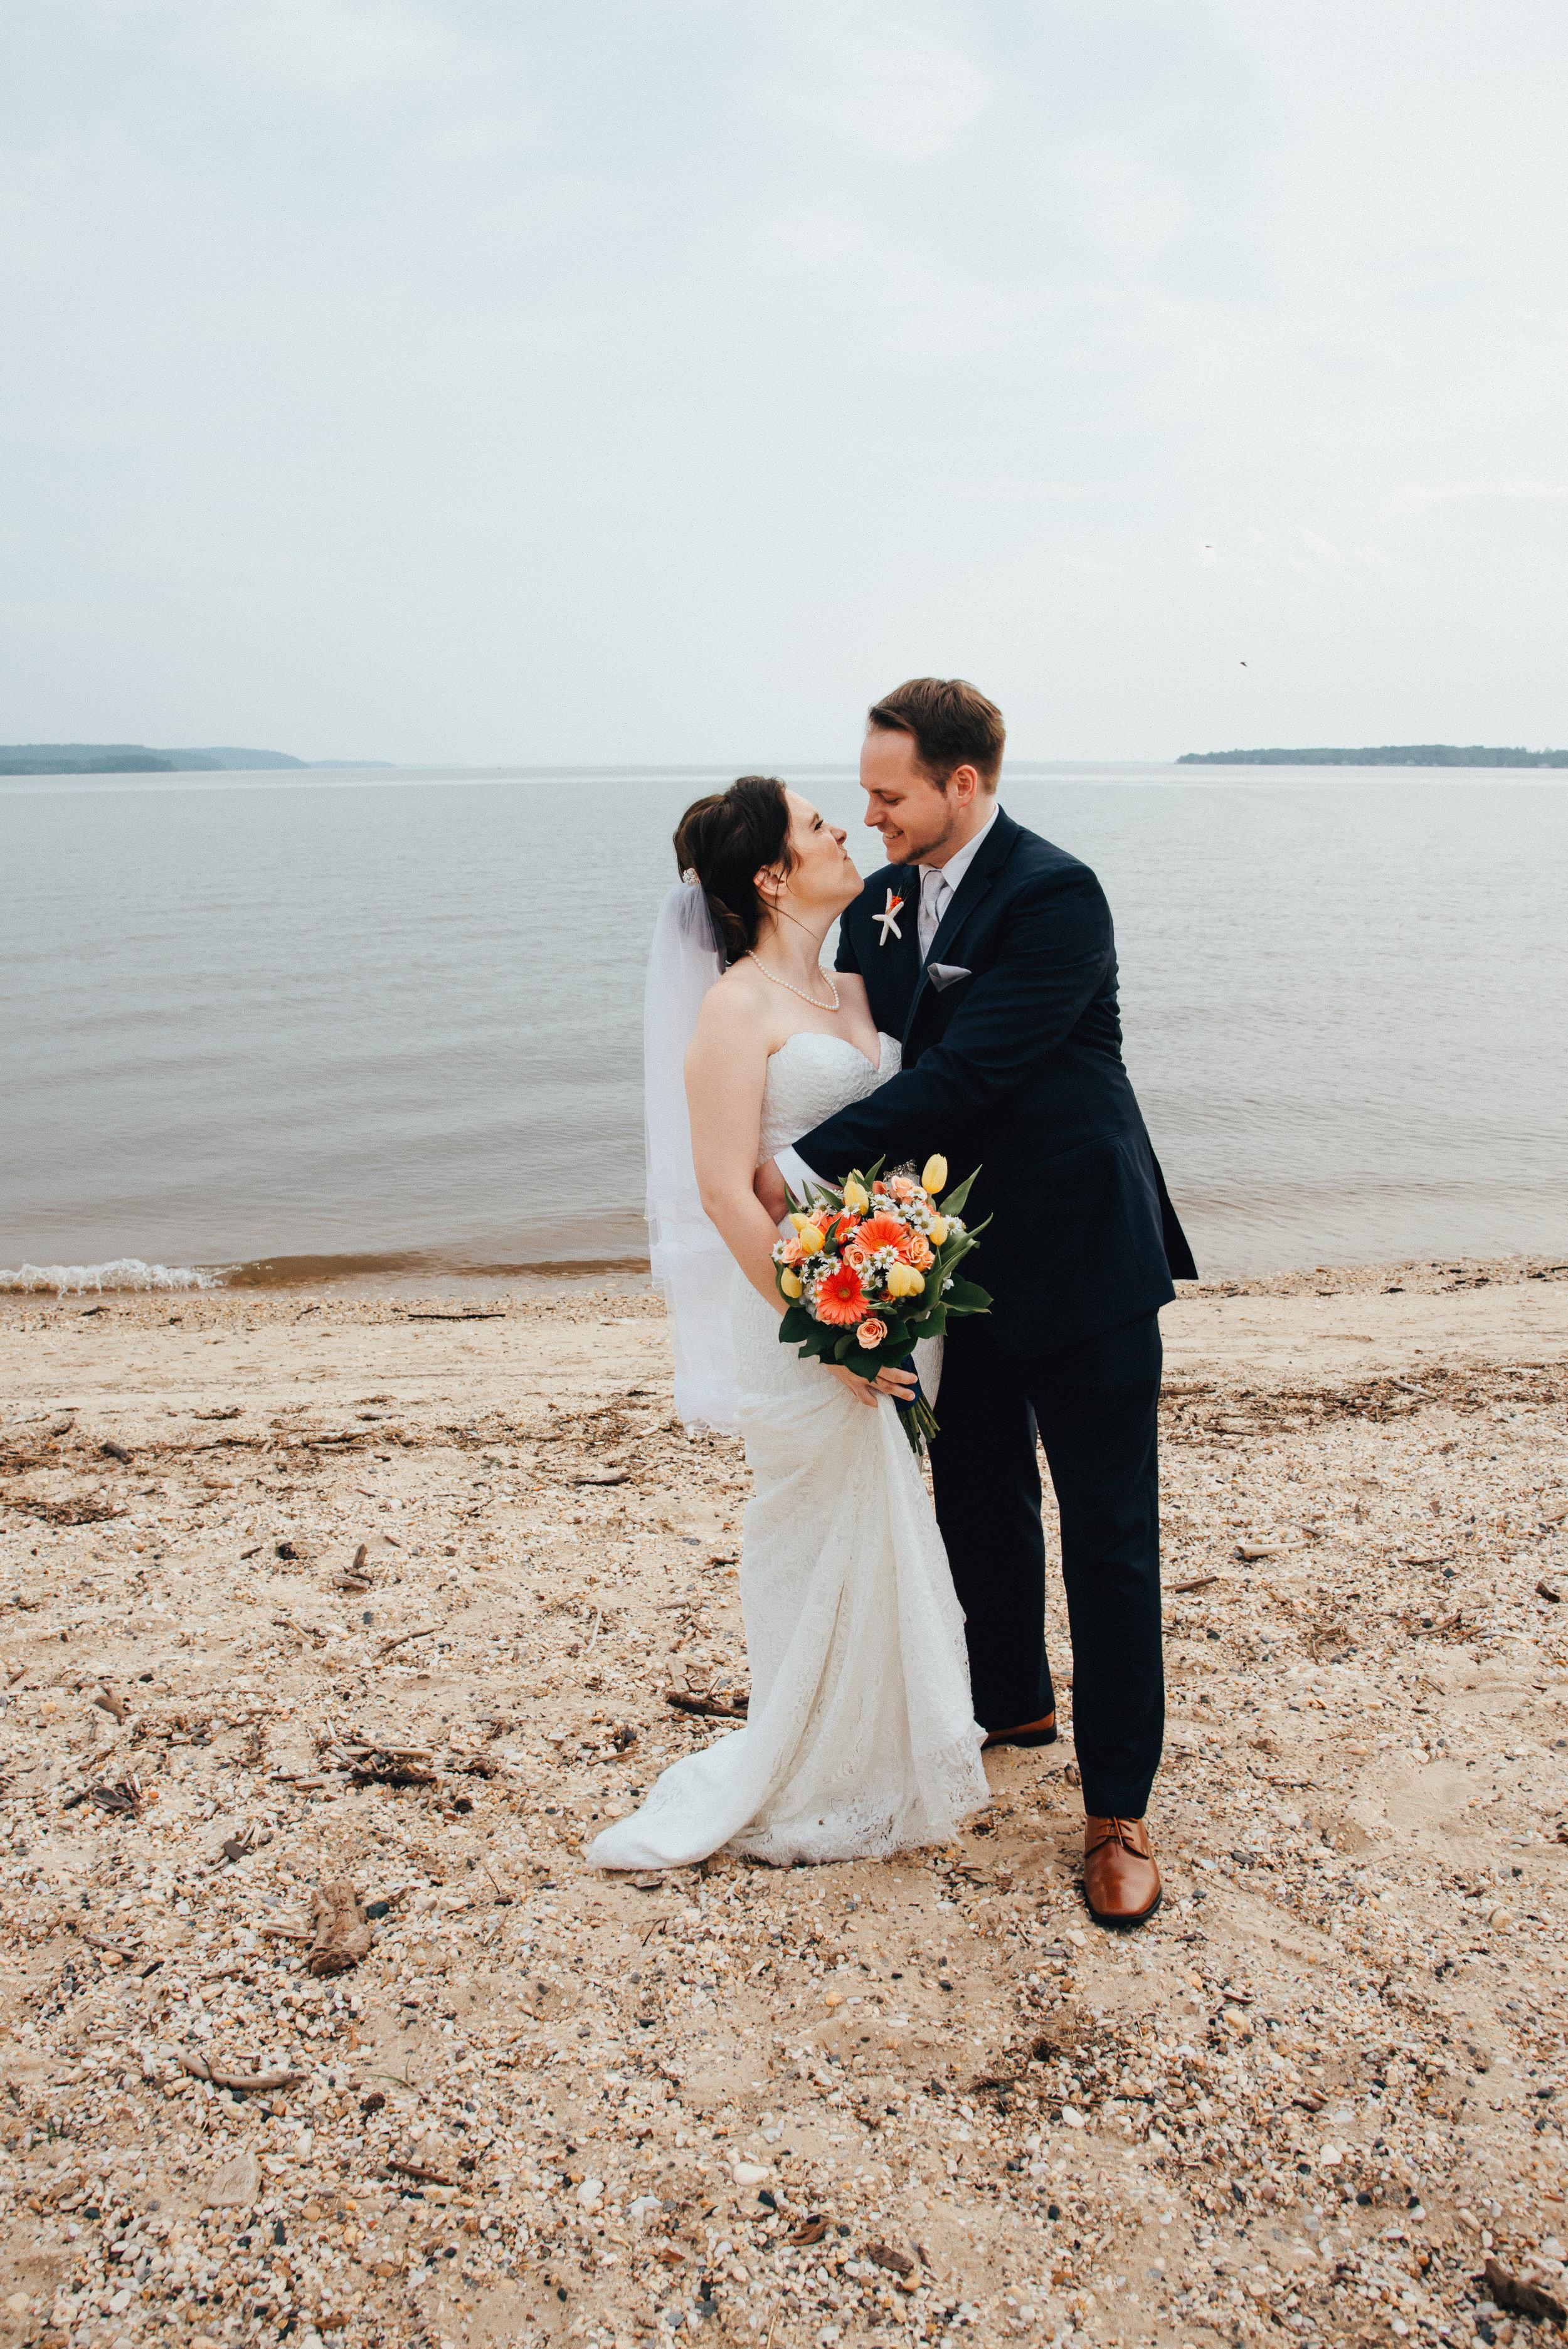 WeddingInstagram_69_2018.jpg